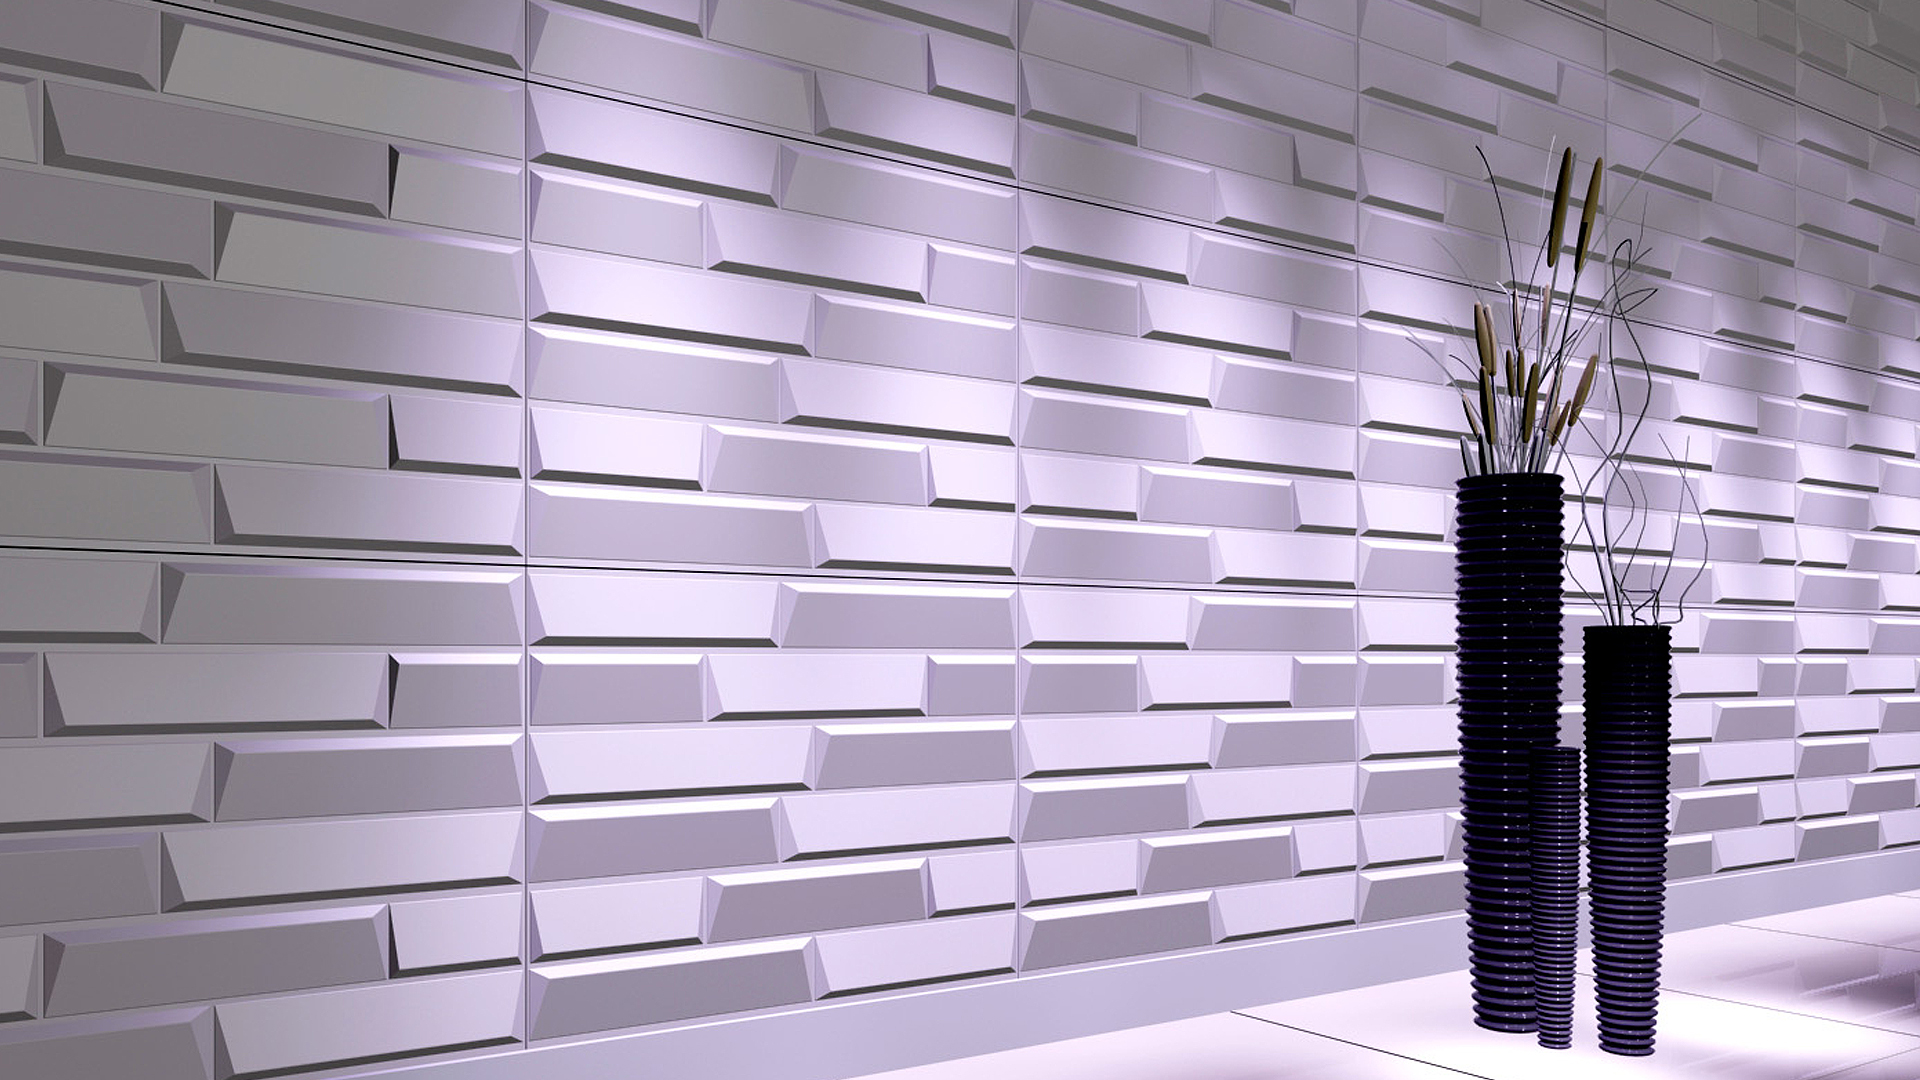 3D Wandpaneele - Produkte - Sandstone - Deckenpaneele - 3D Tapeten - Wandverkleidung